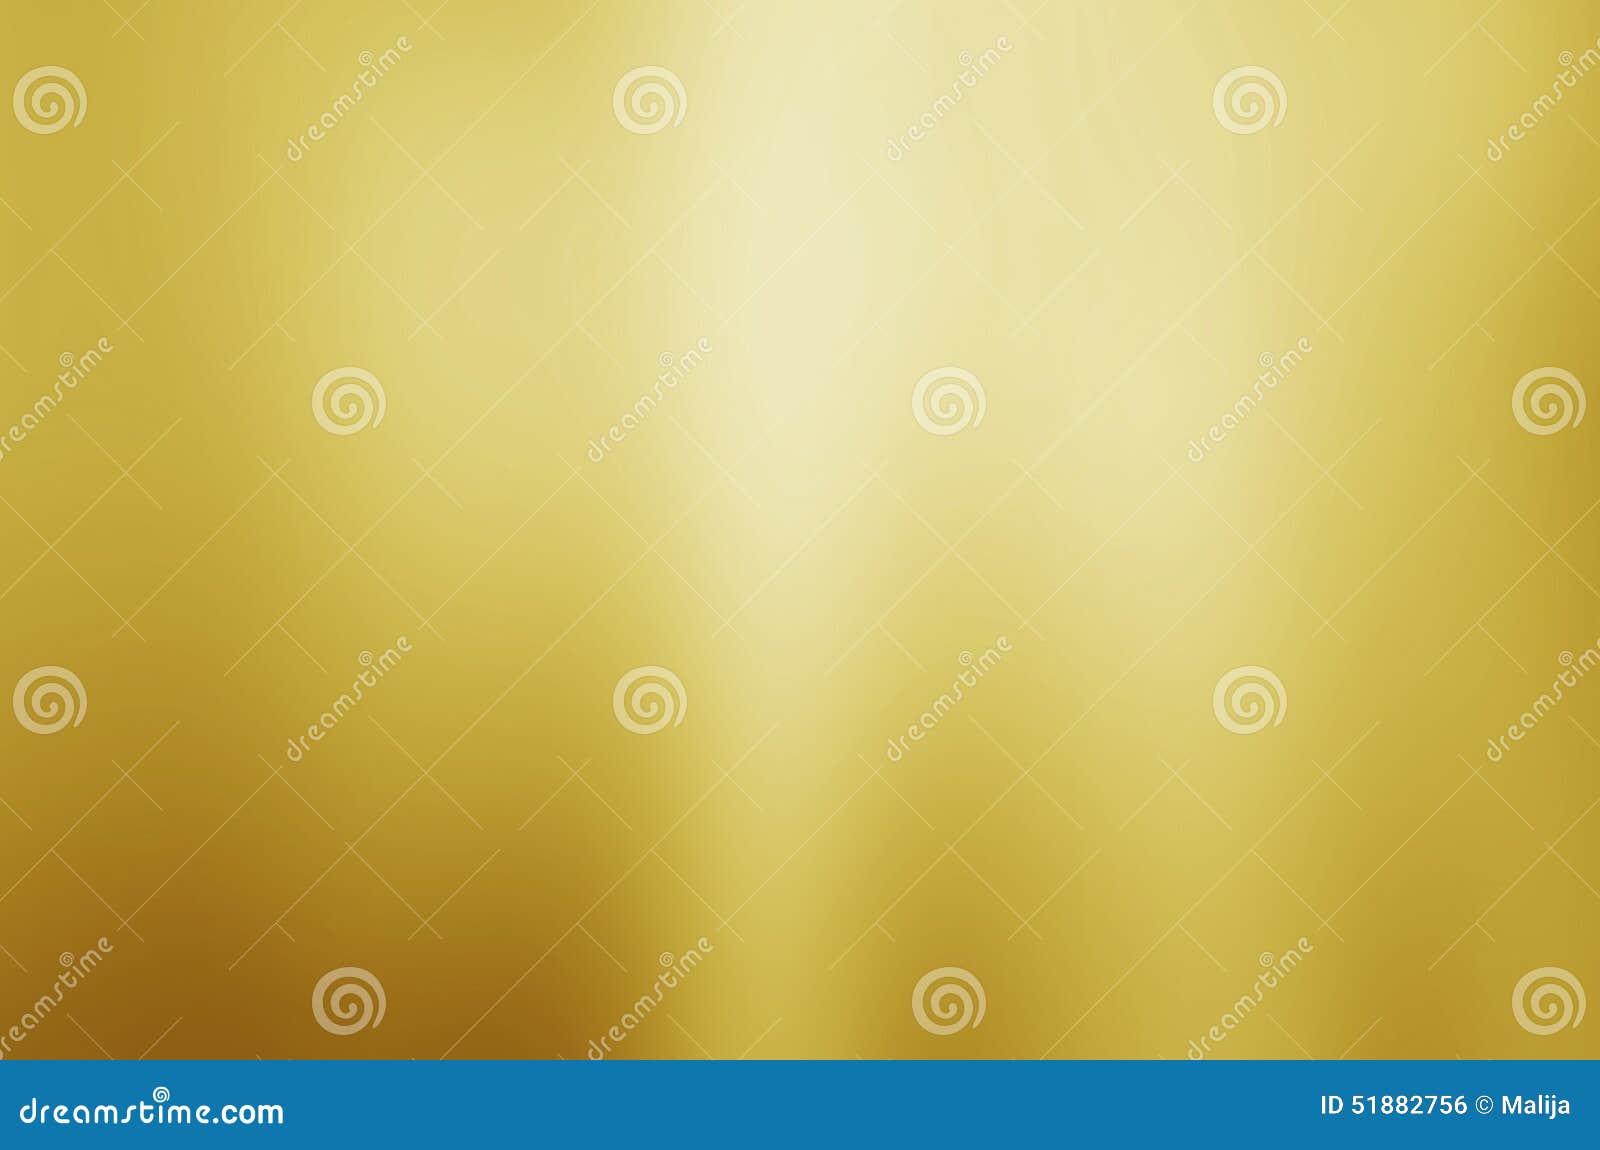 Gold blurred texture background